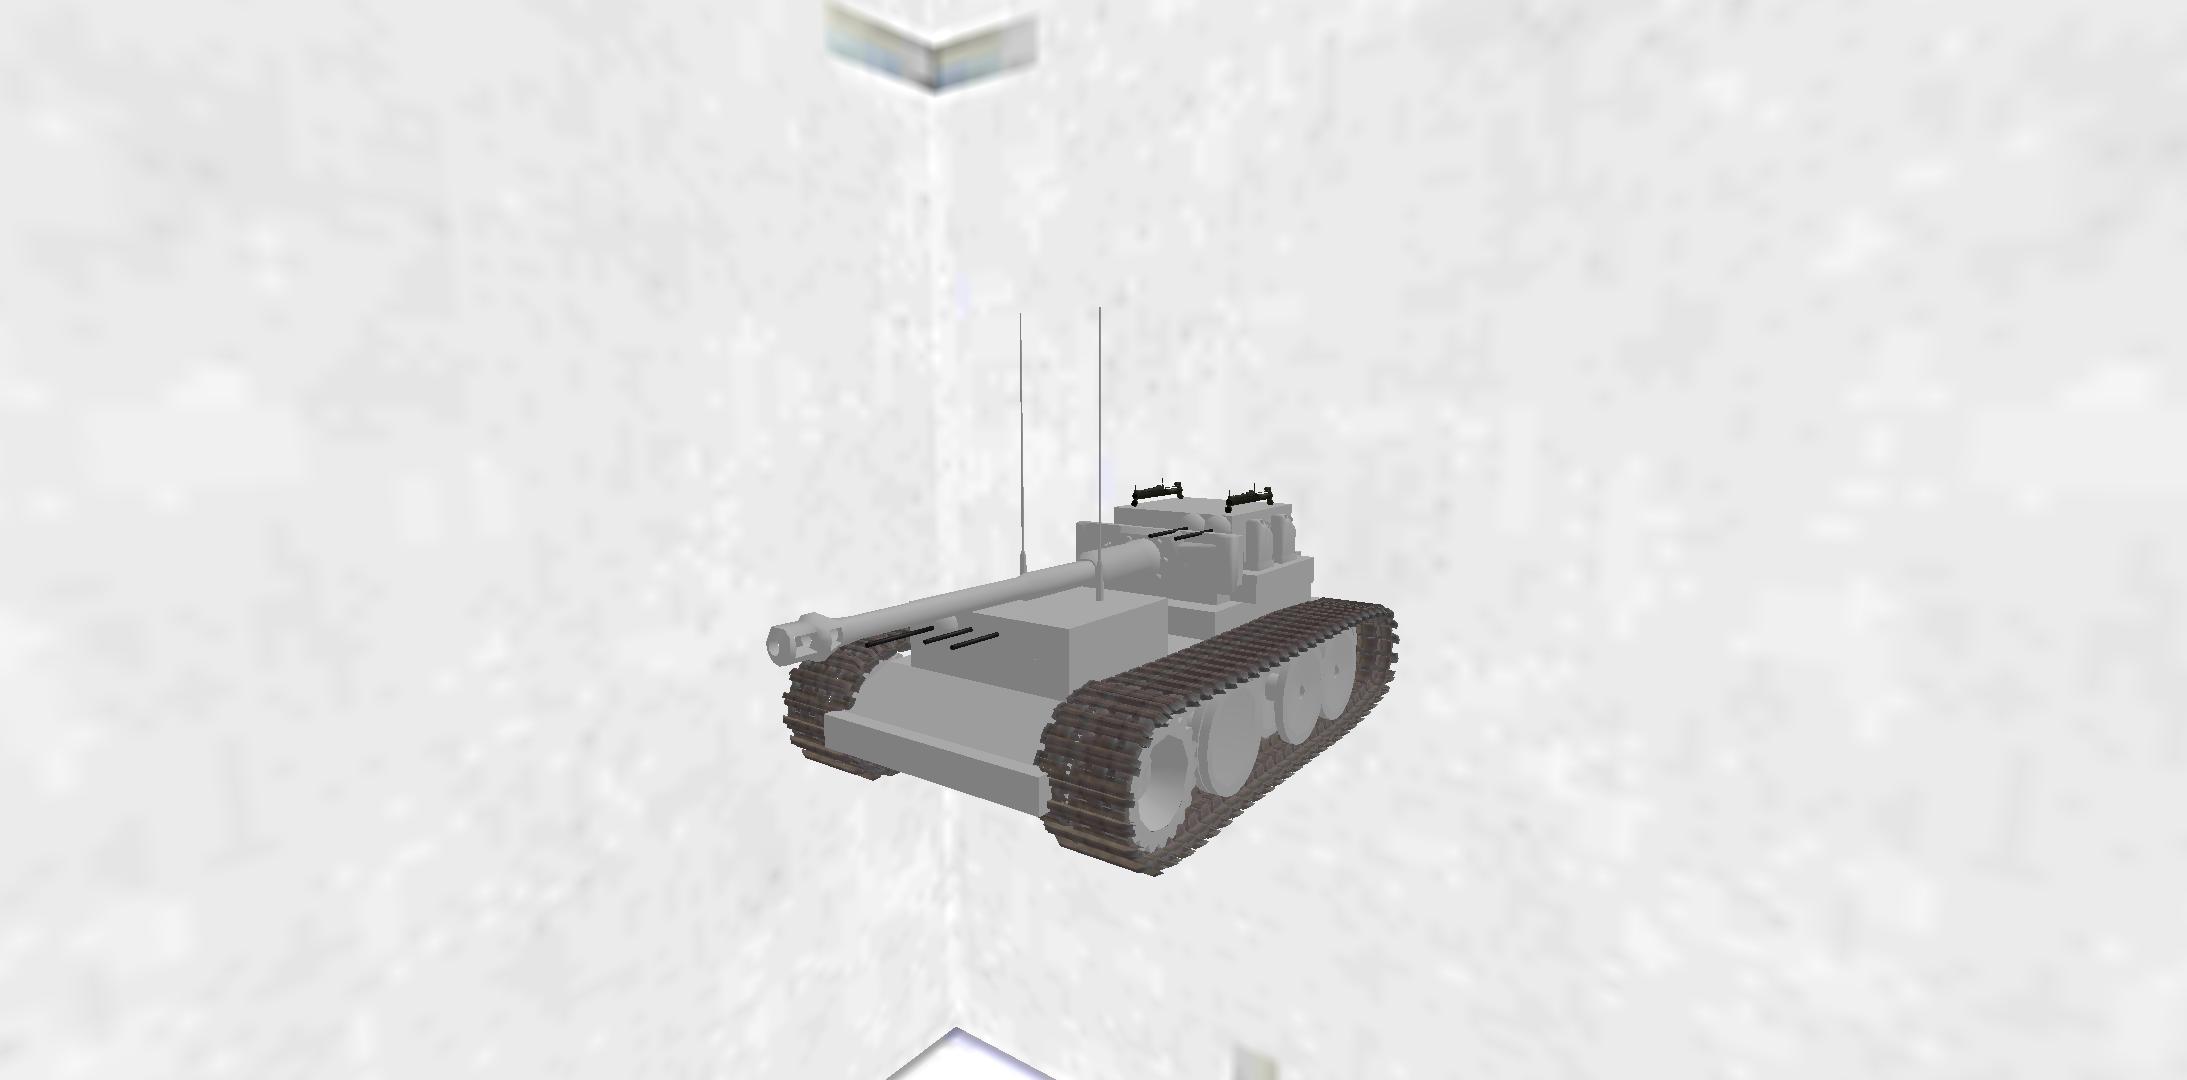 Heavy tank destroyer